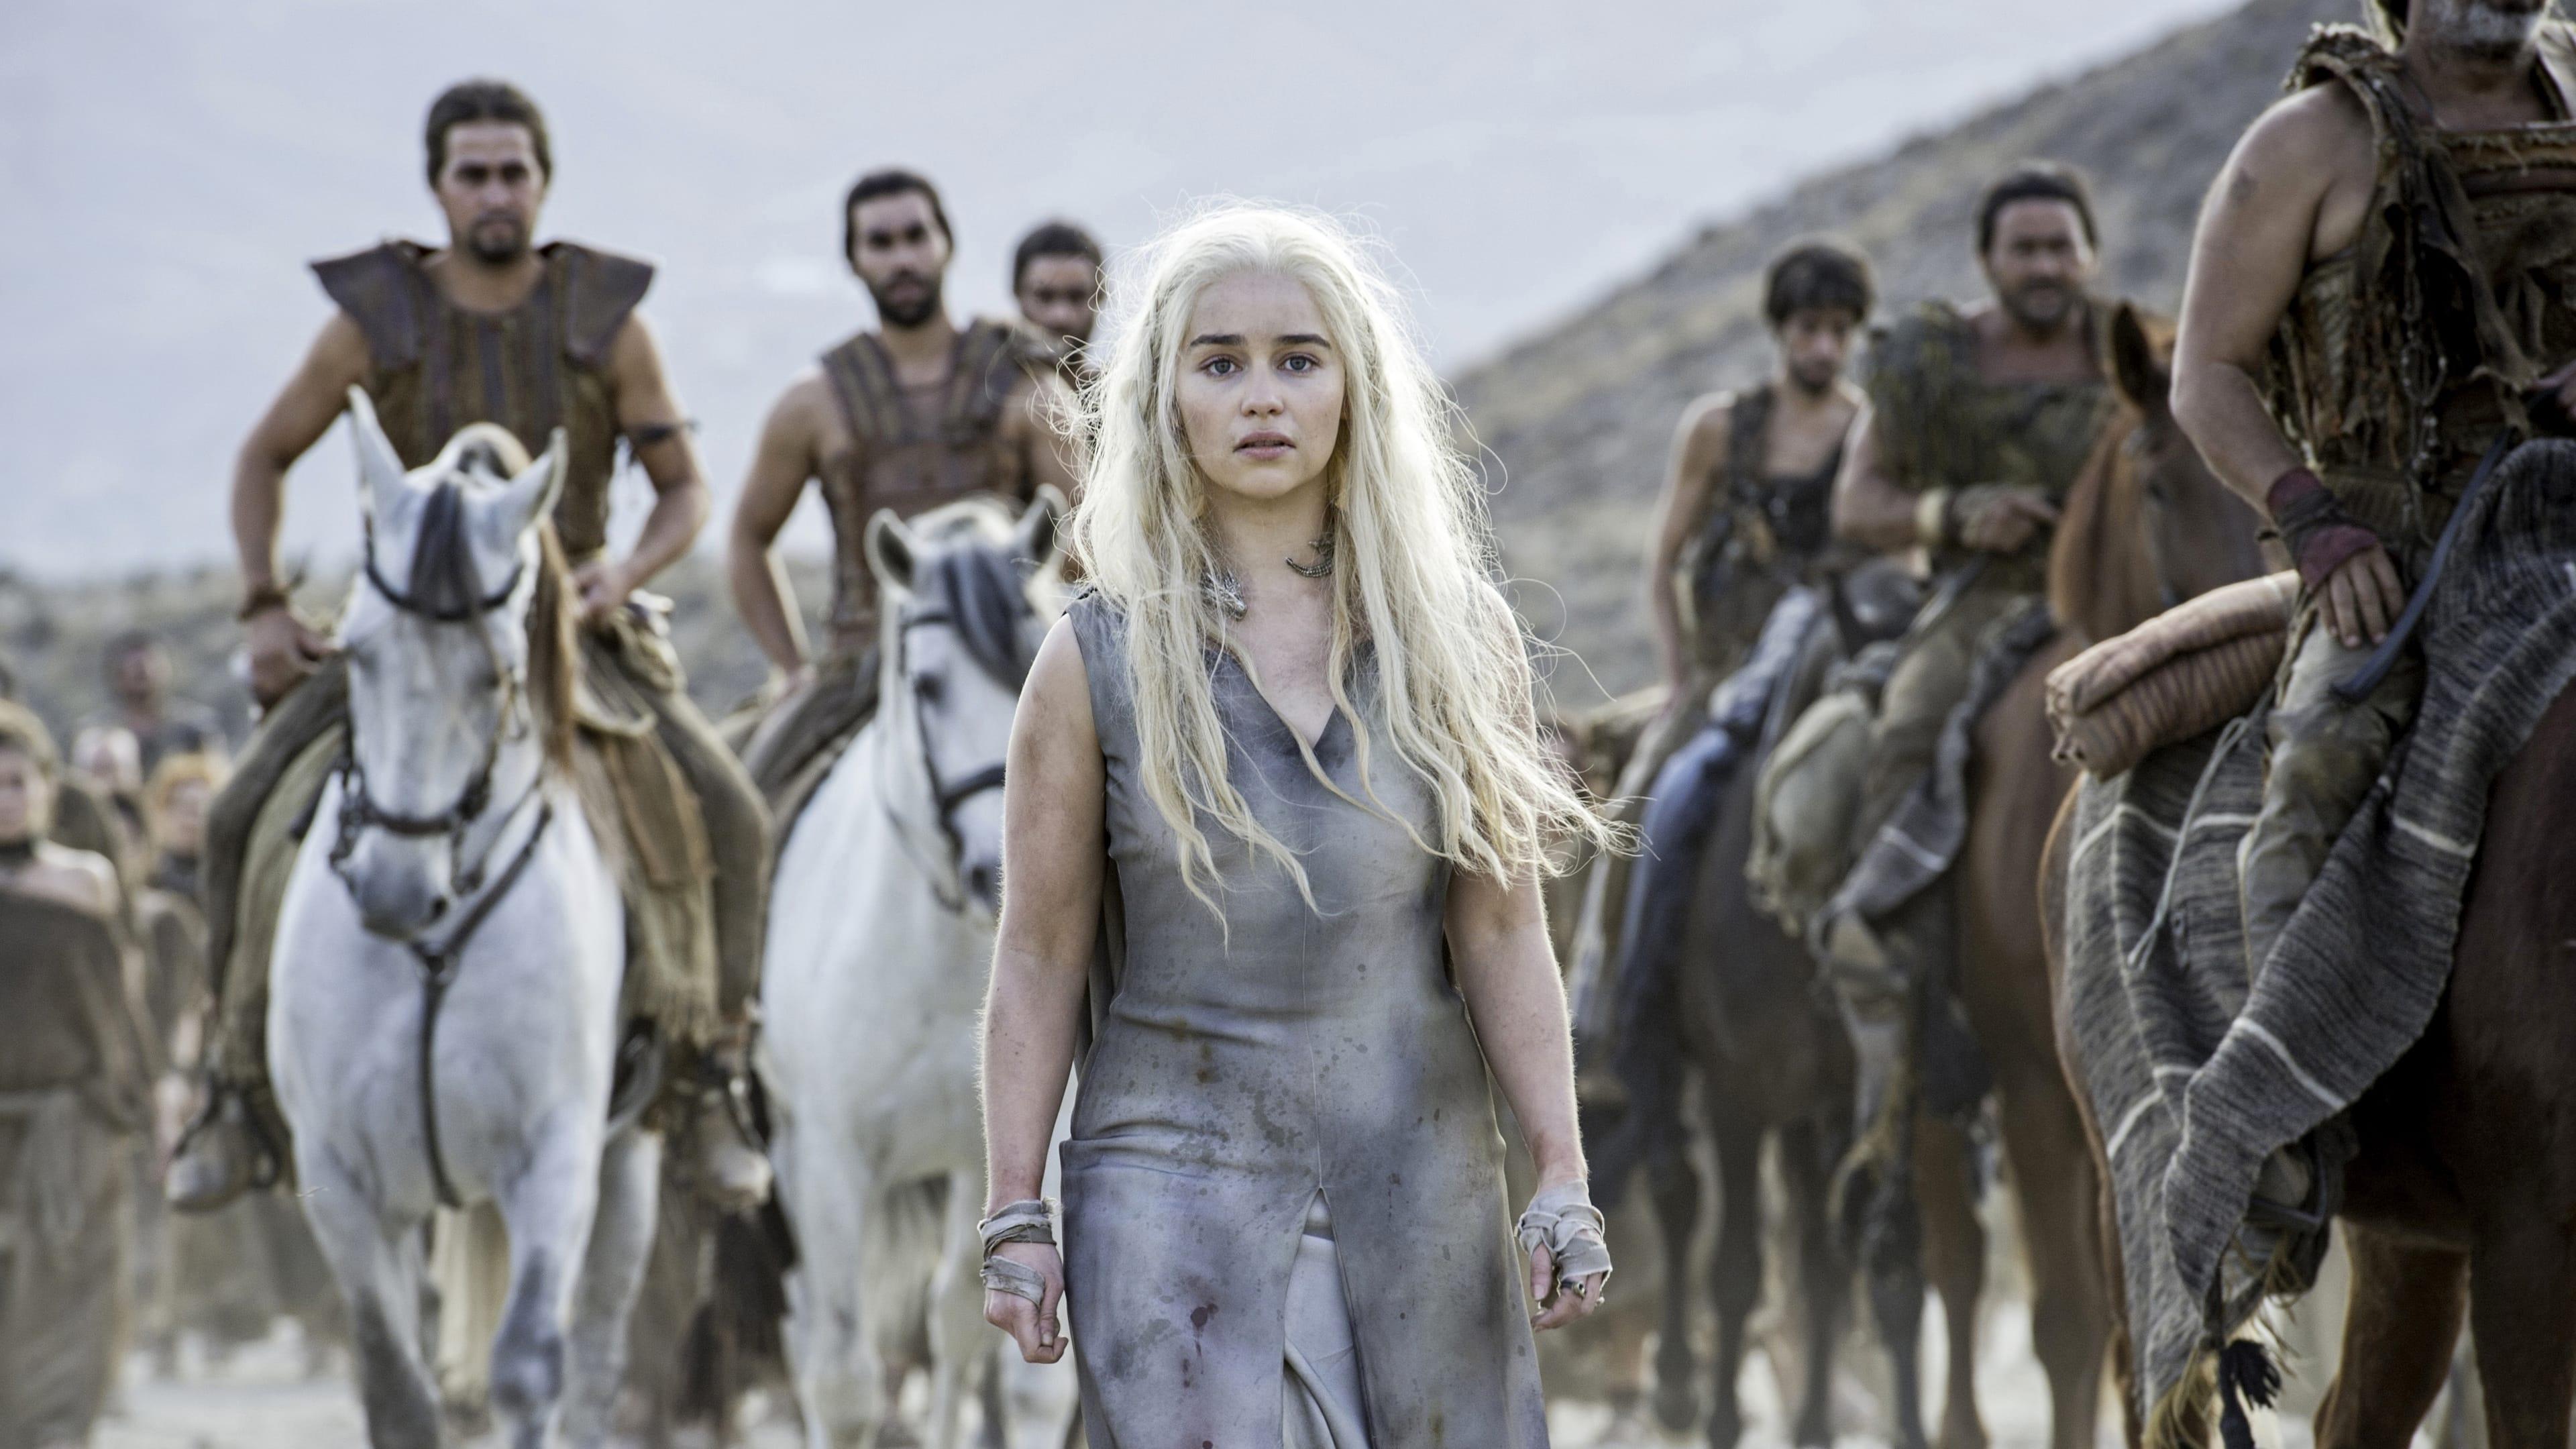 game of thrones season 6 episode 3 stream online free